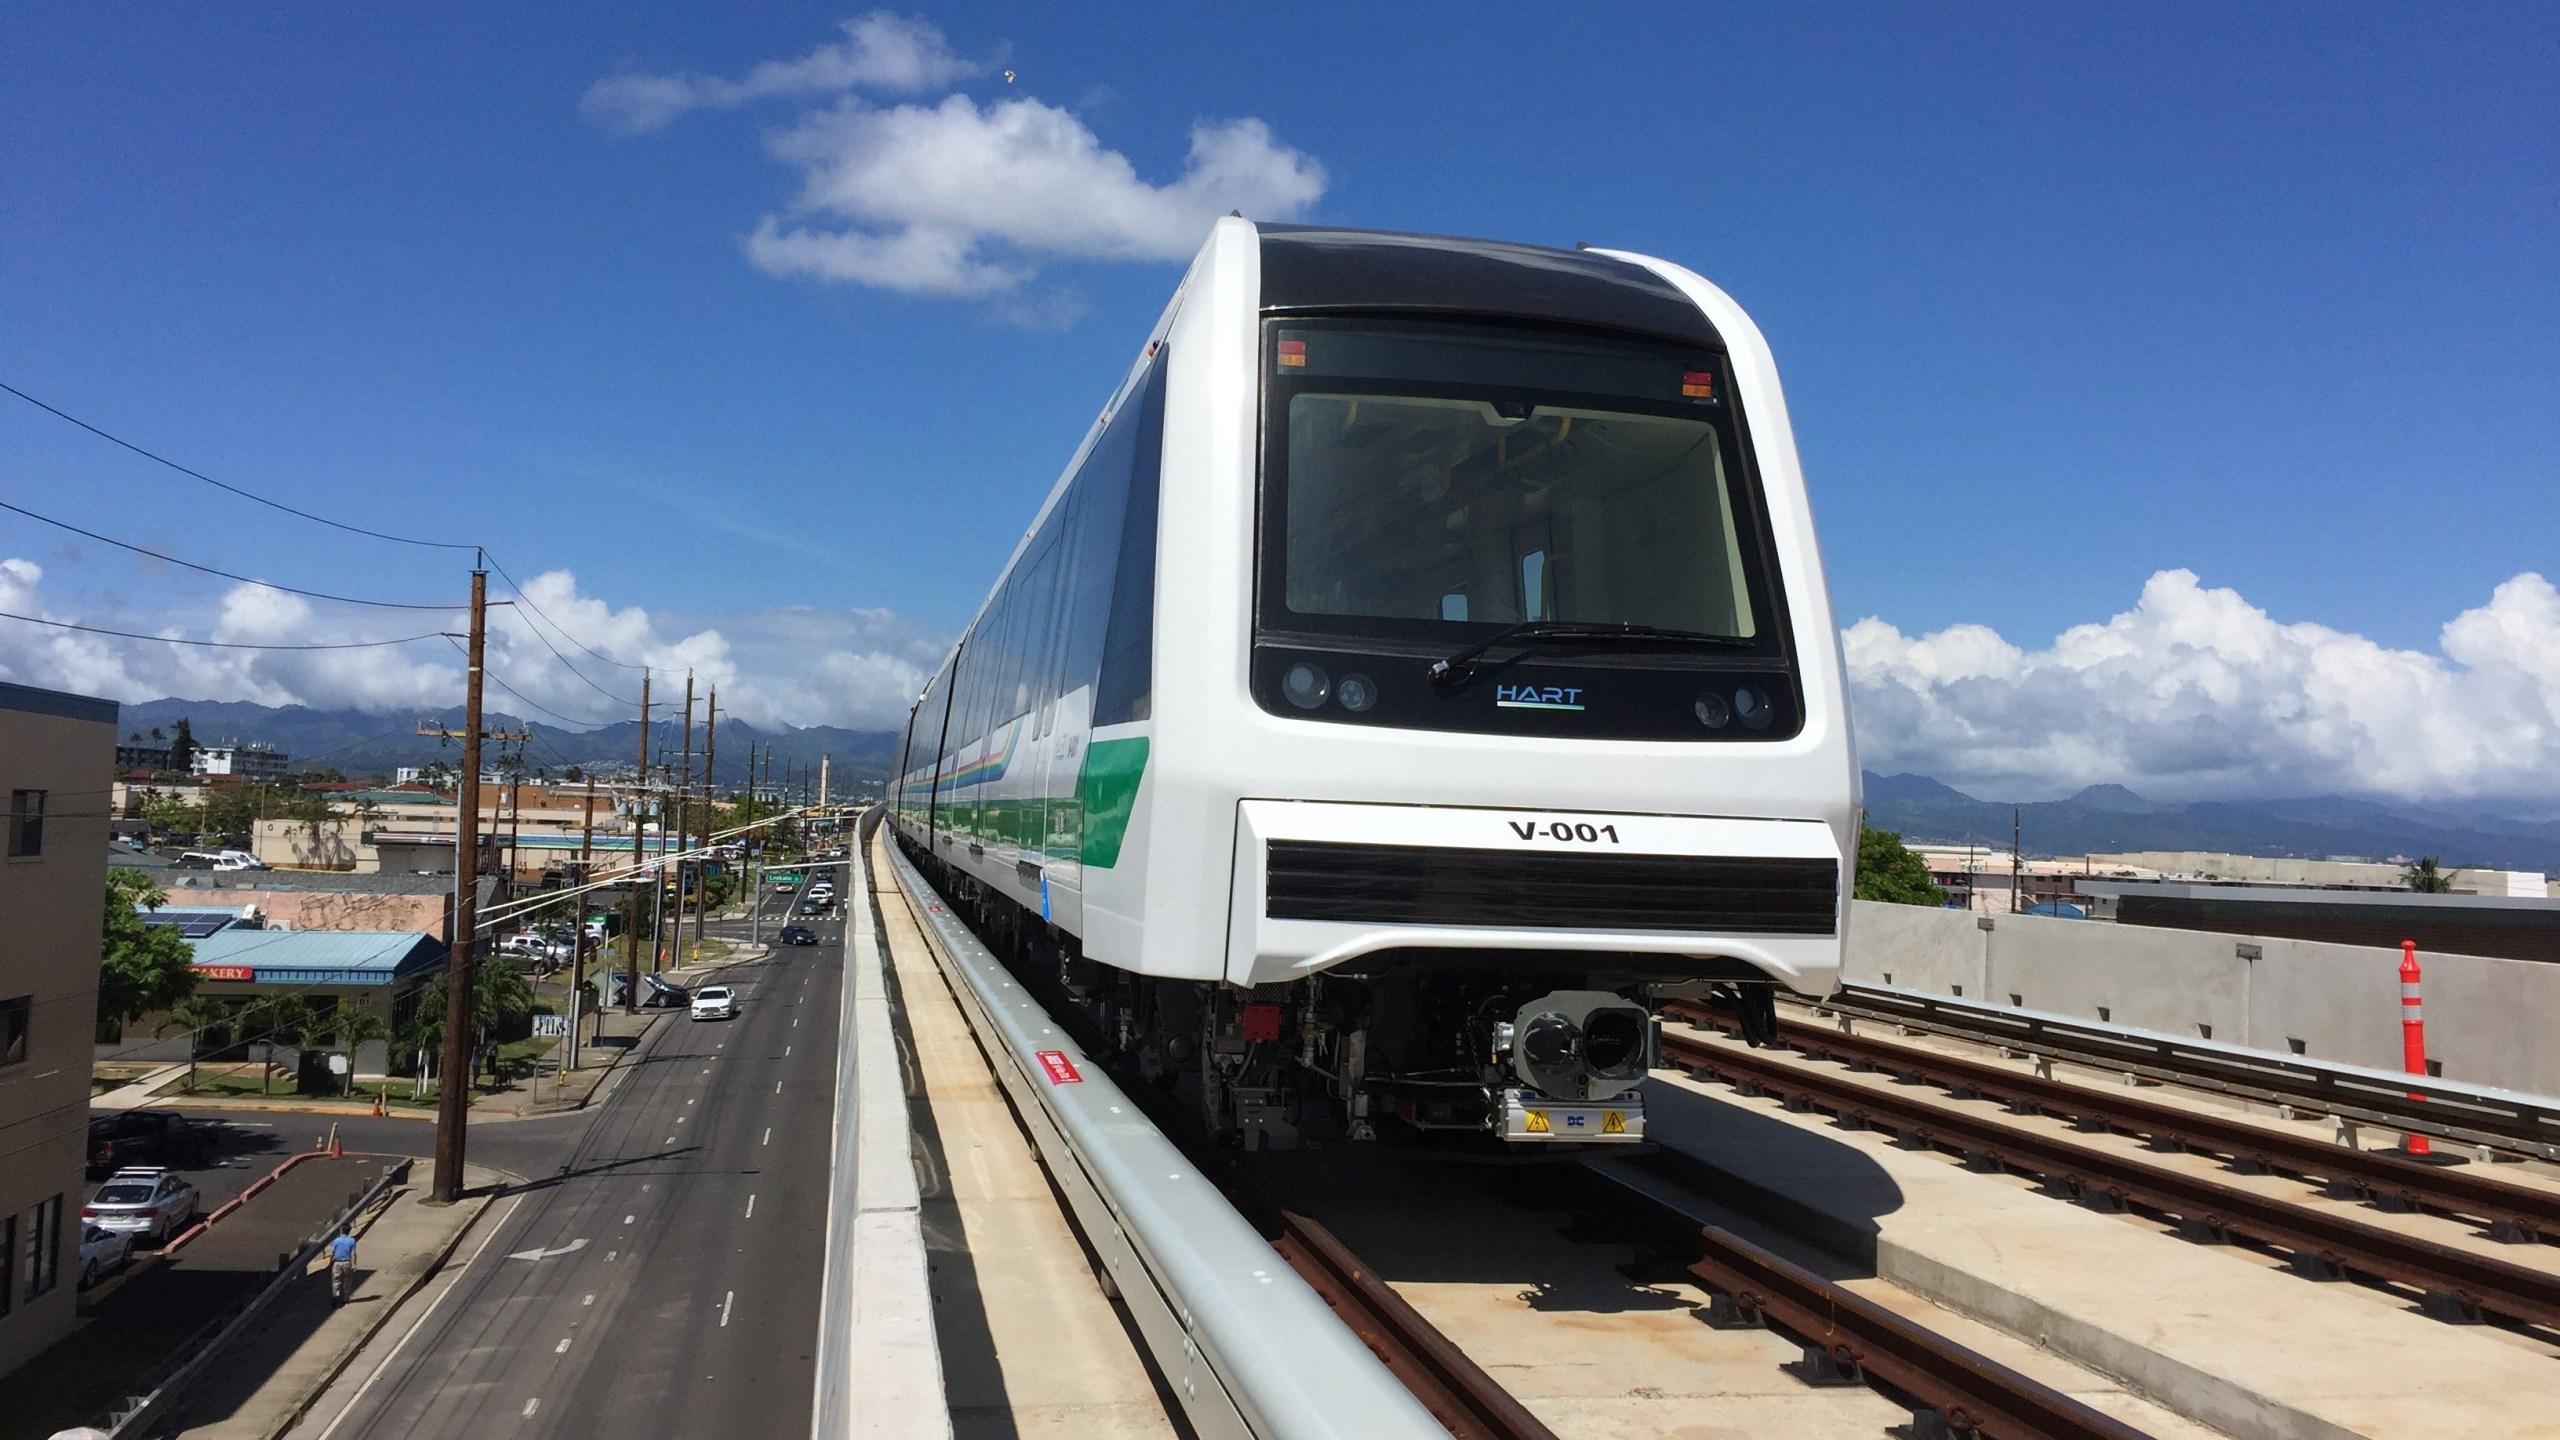 rail on guideway_211387